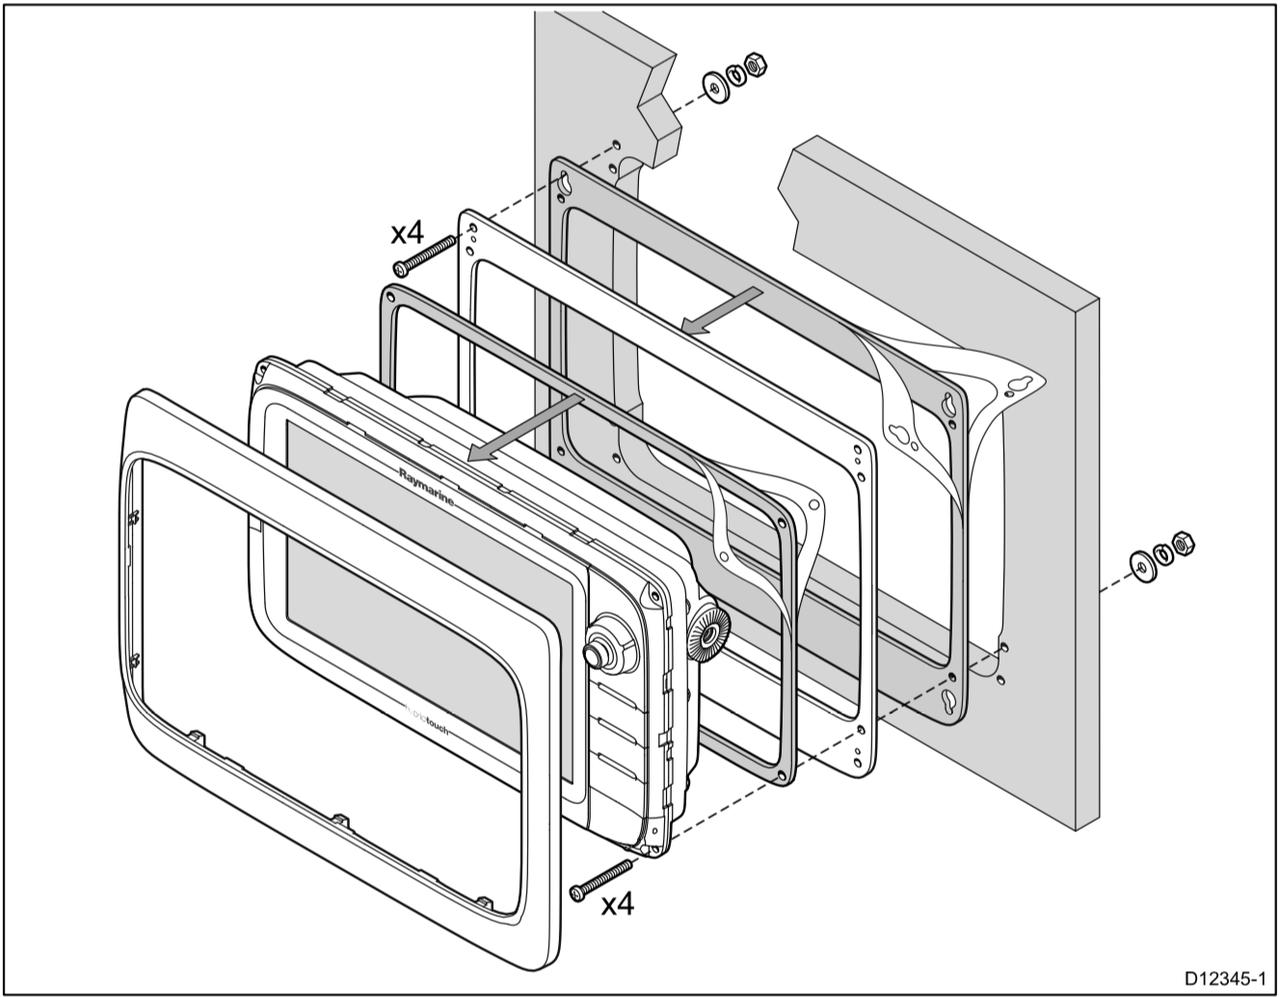 bosch map sensor wiring diagram harley davidson download garmin 498 17 gps diagrams schematics 4 wire